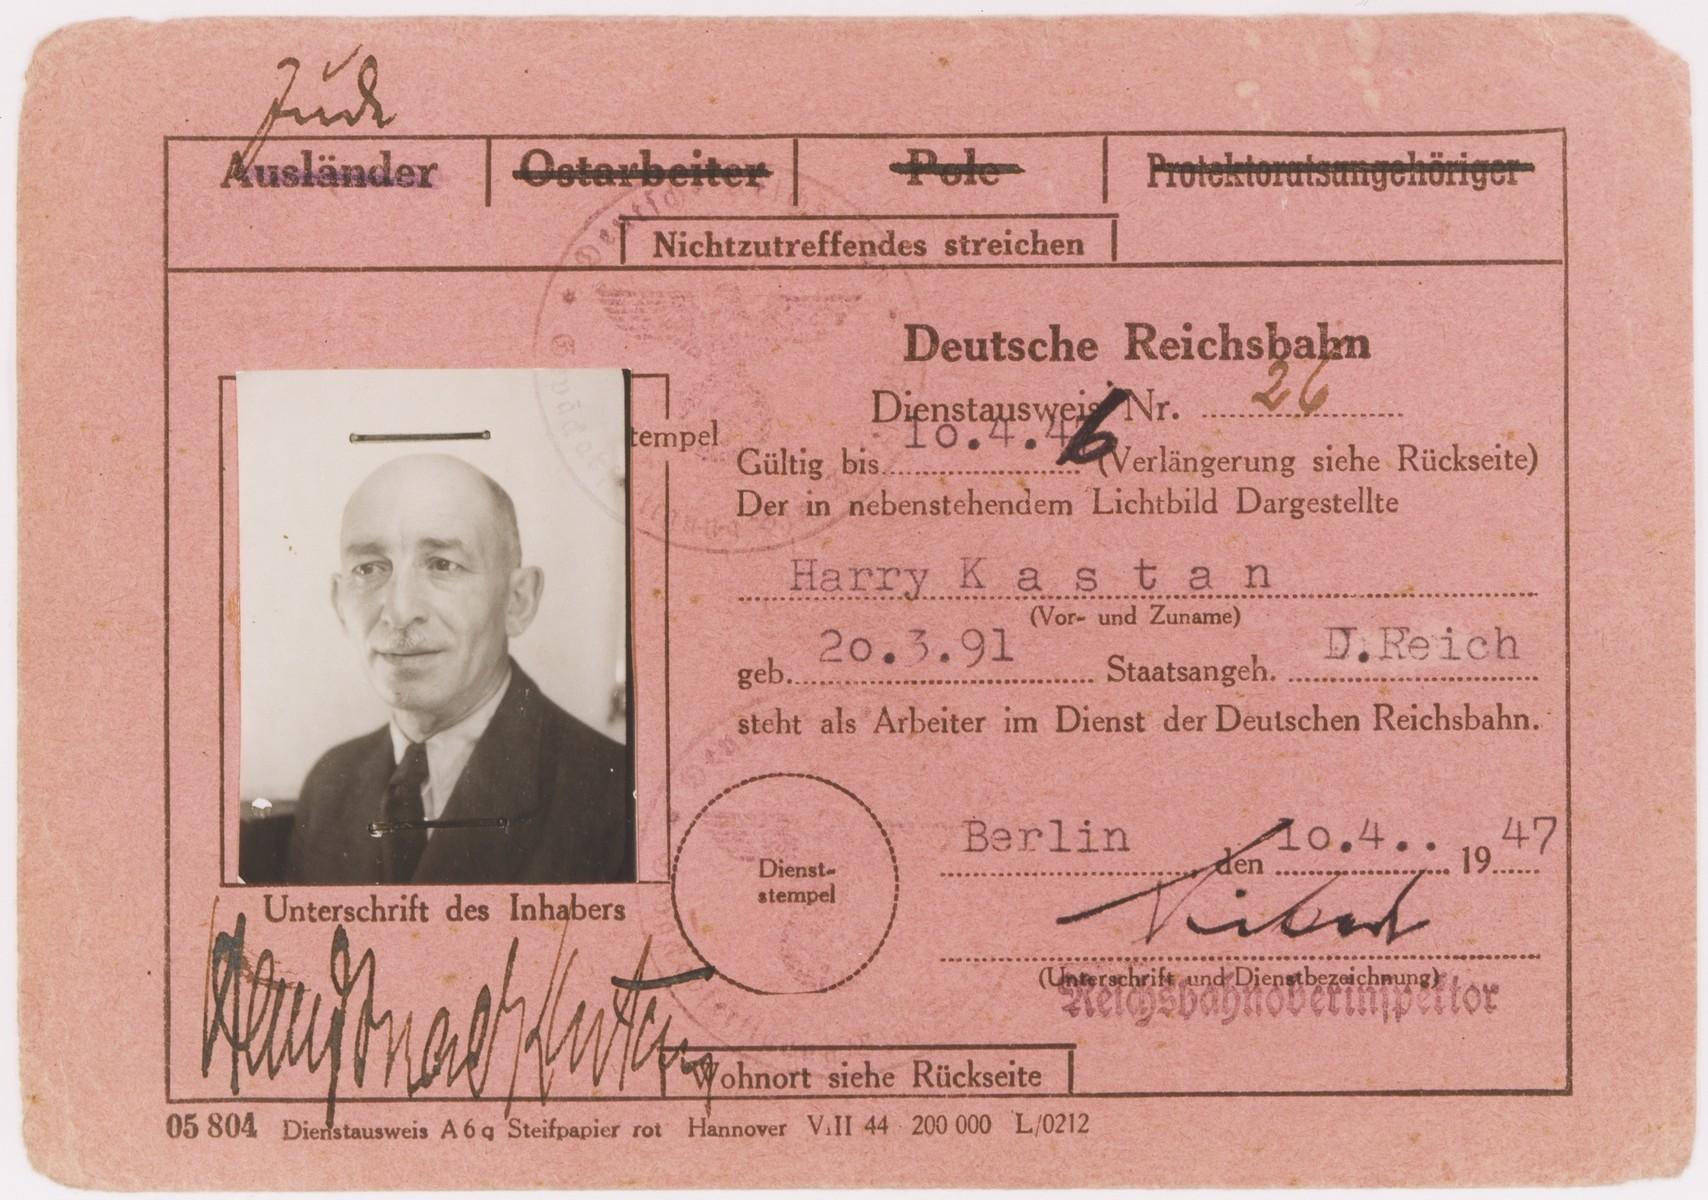 Identification card certifying that Harry Kastan (b. March 20, 1891), a Jewish survivor from Berlin, is an employee of the German Reichsbahn.